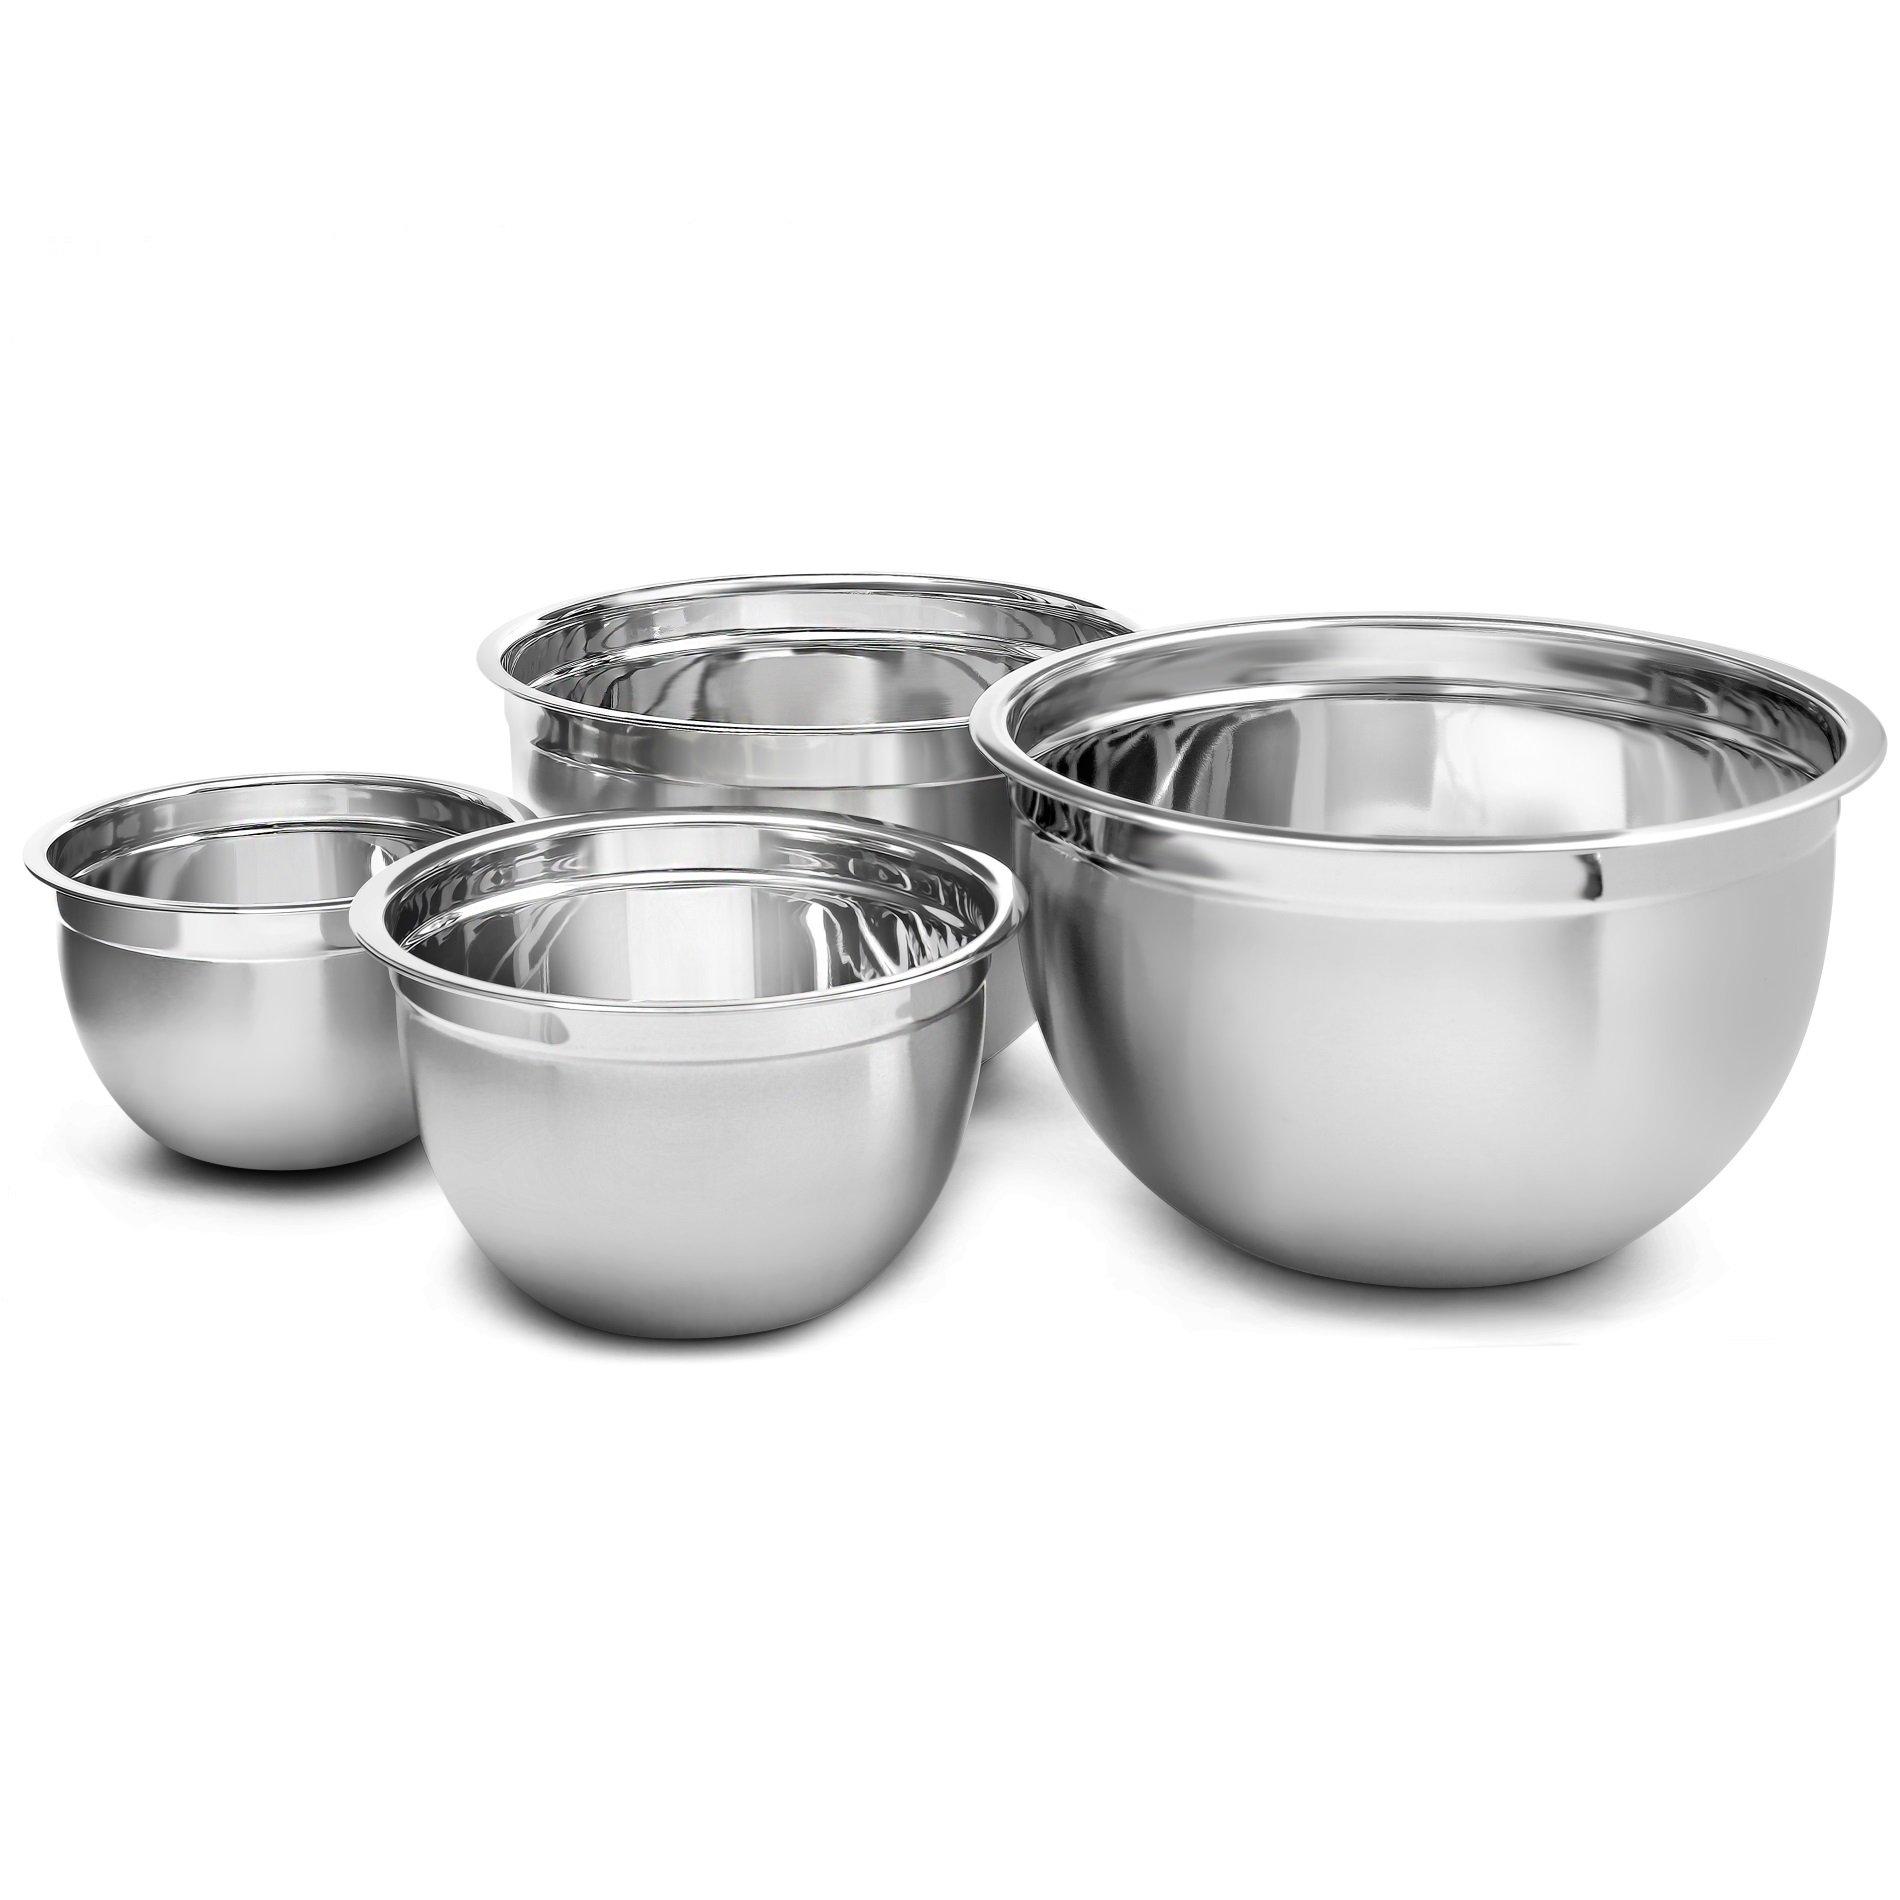 YBM Home 1170-71-72-73set Deep Professional Heavy Duty Quality Stainless Steel Mixing Bowls, 12 Quart by YBM HOME